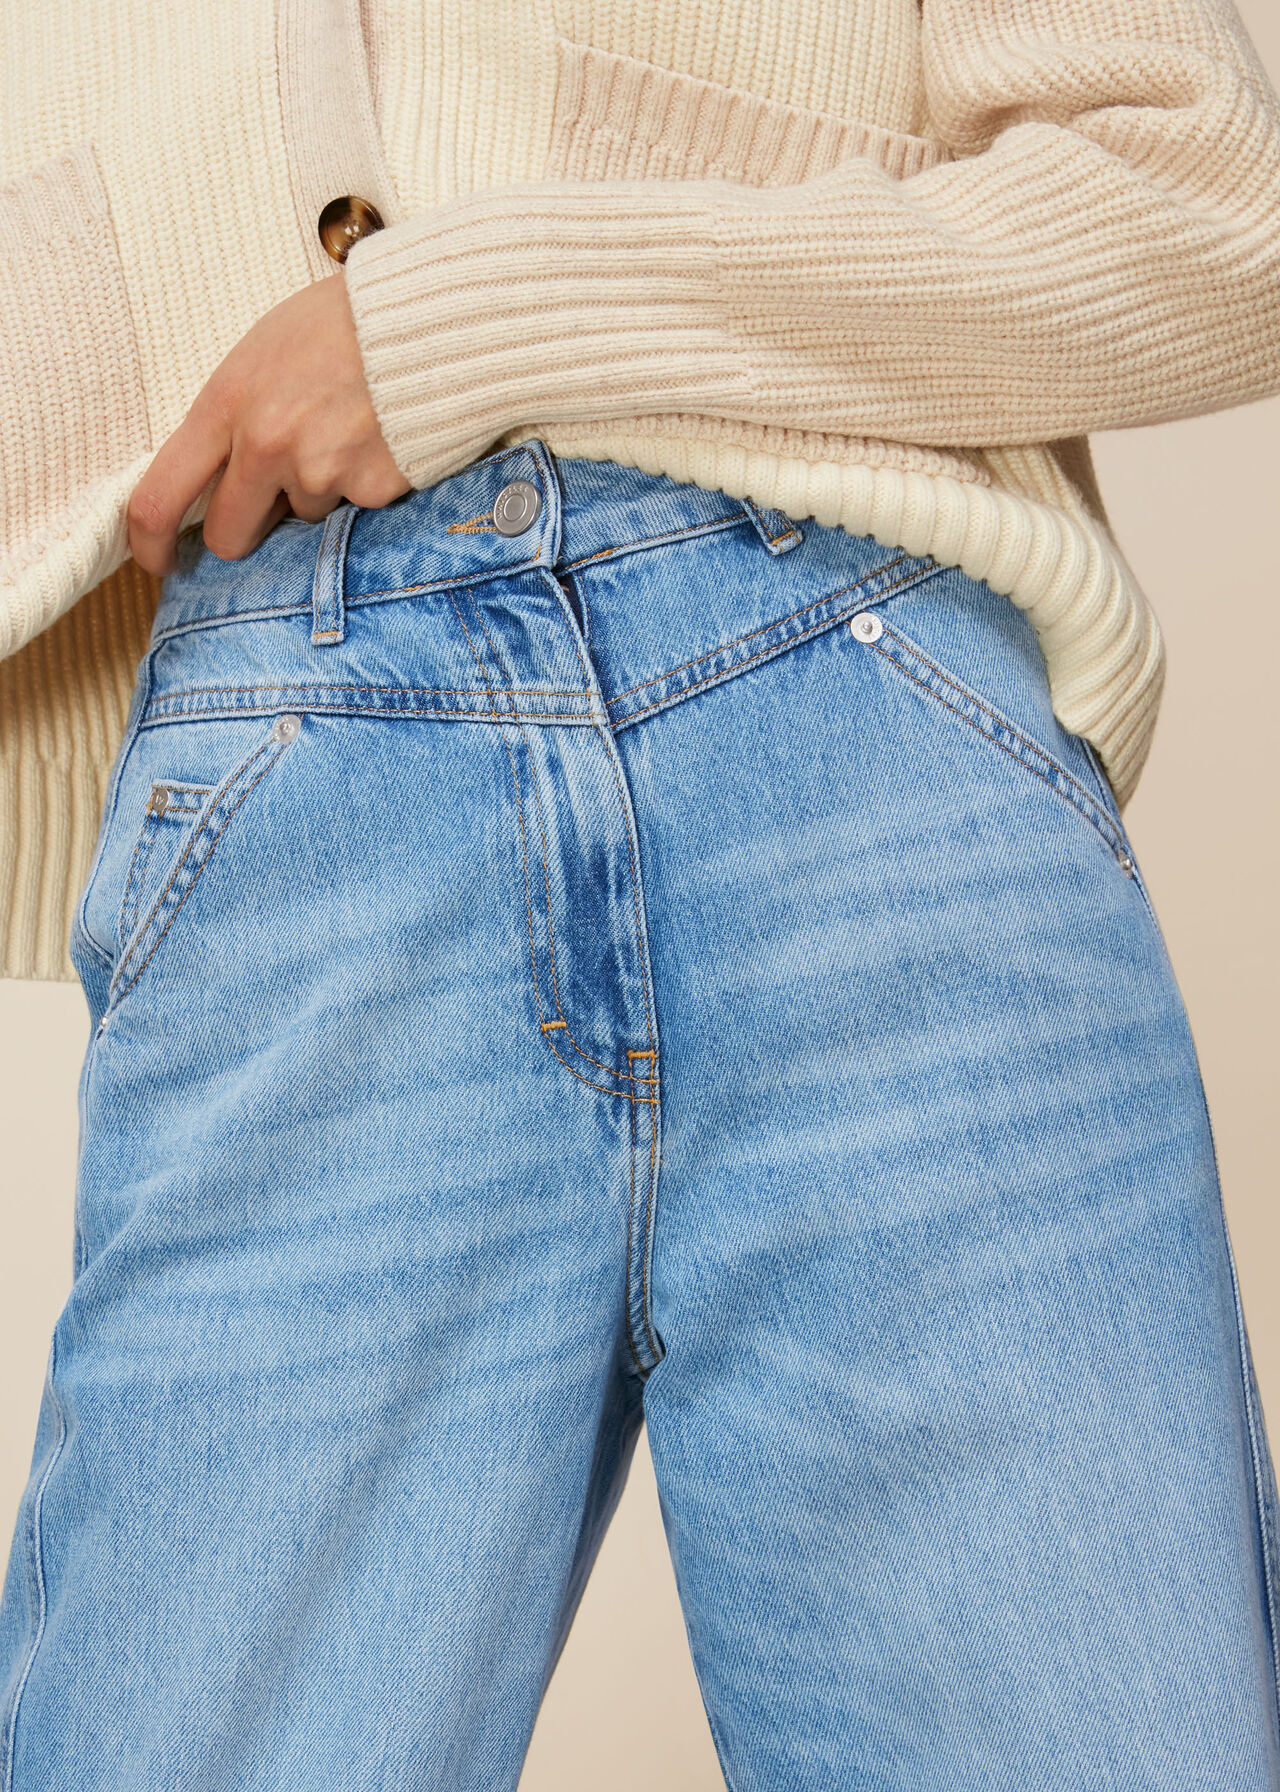 Seam Detail Jean